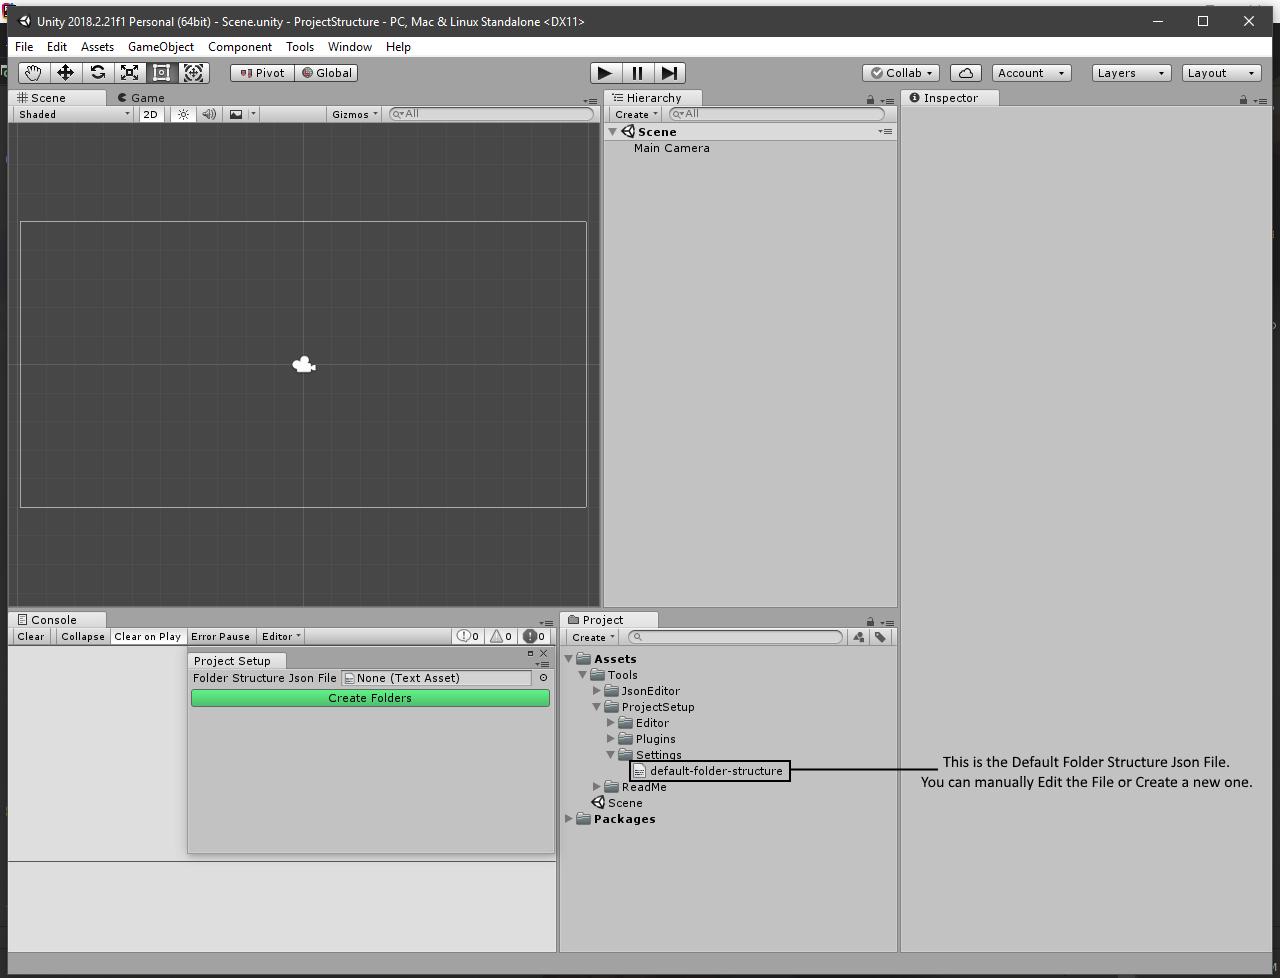 Project Setup Tool by Uee